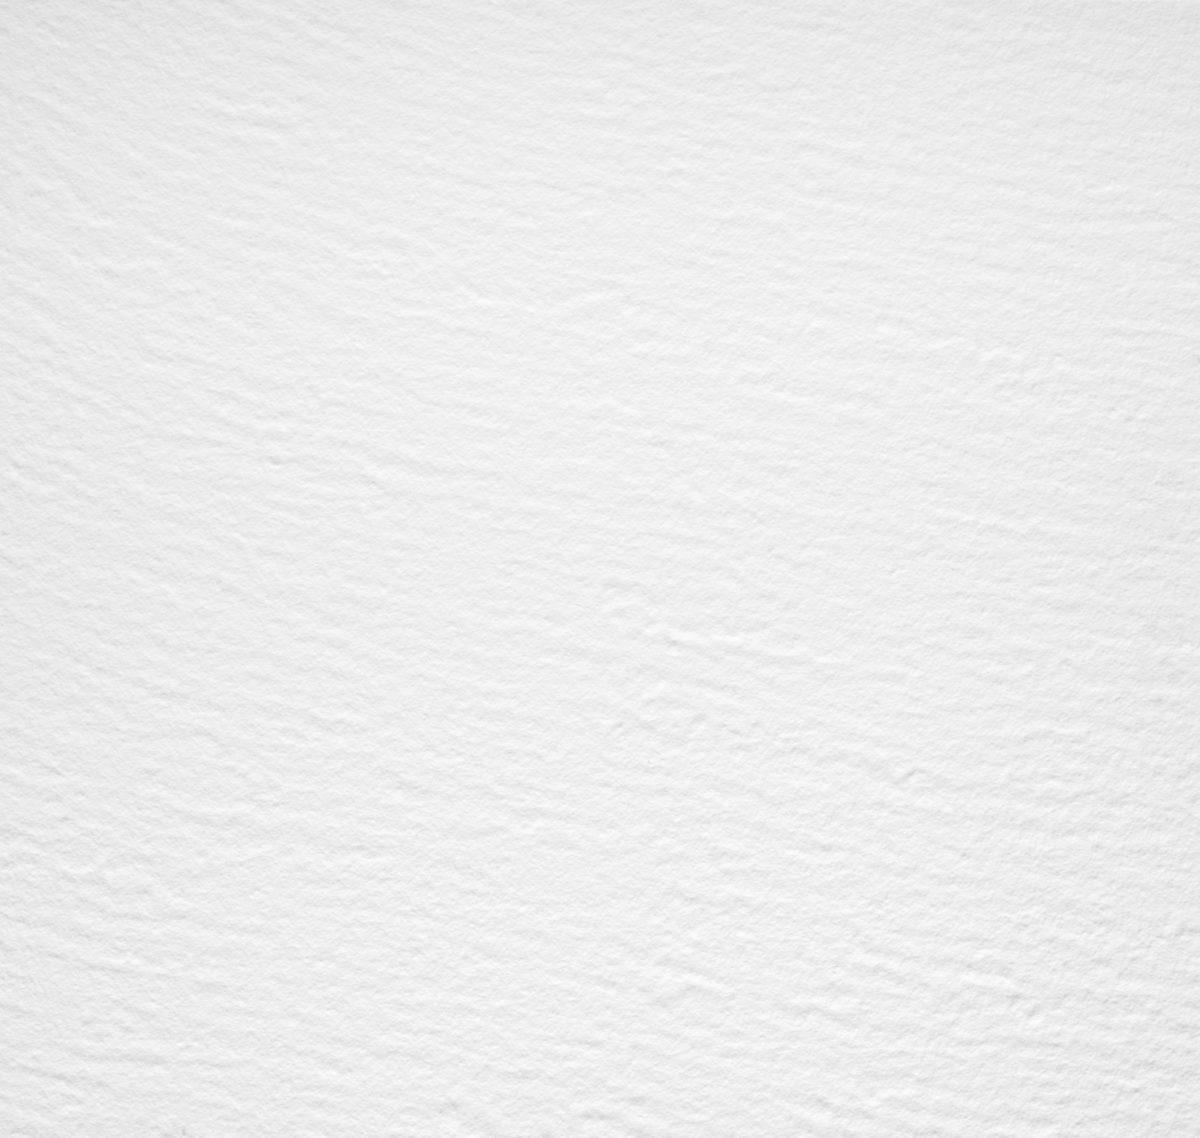 Lapitech Worktop Absolute White - Dunes Finish